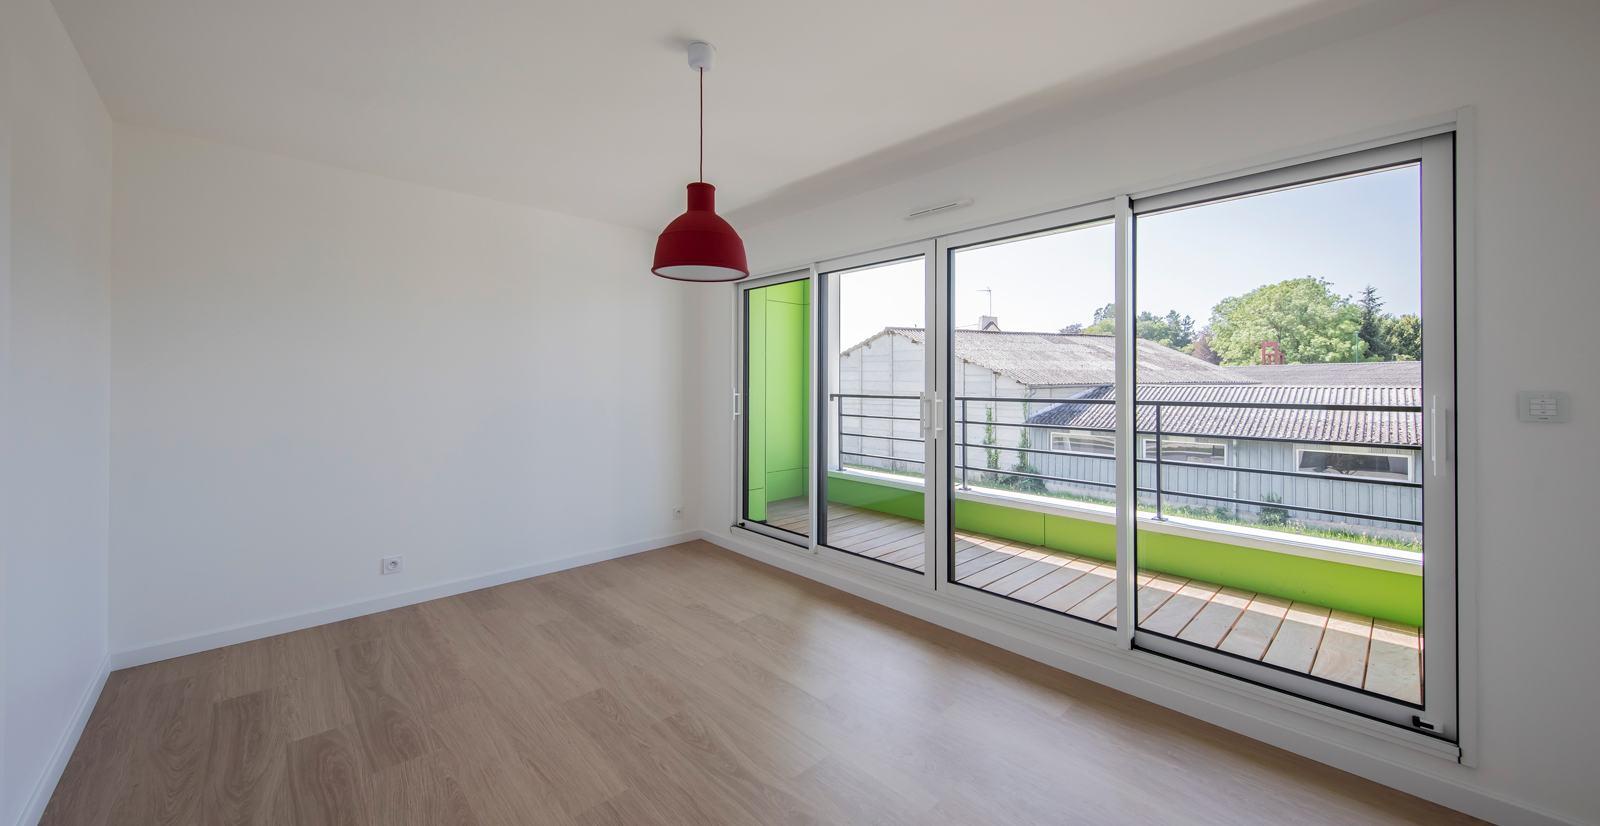 Chambre lumineuse avec grand balcon